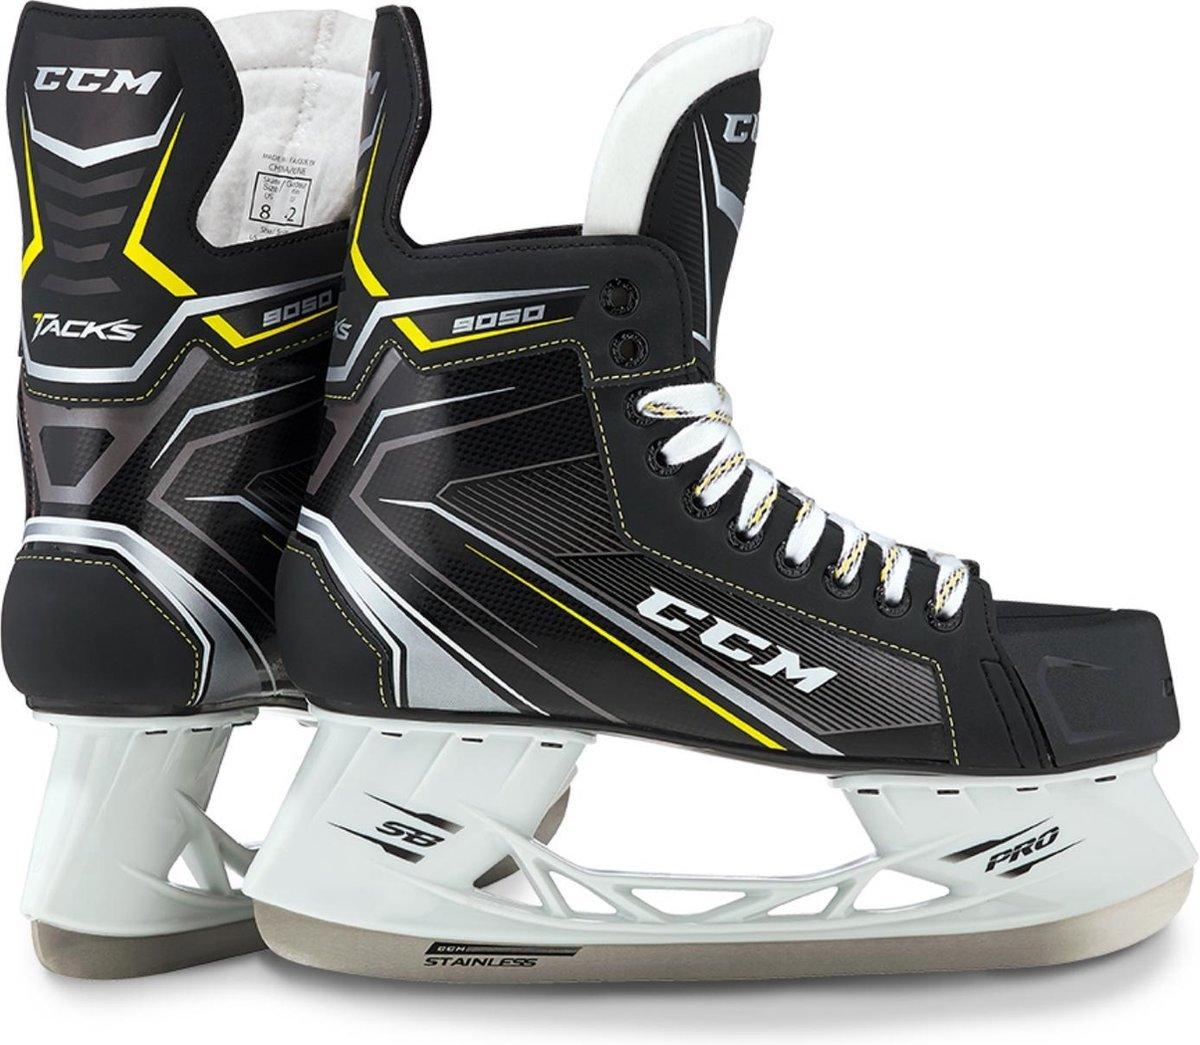 CCM IJshockeyschaatsen TACKS 9050 JR Zwart 36